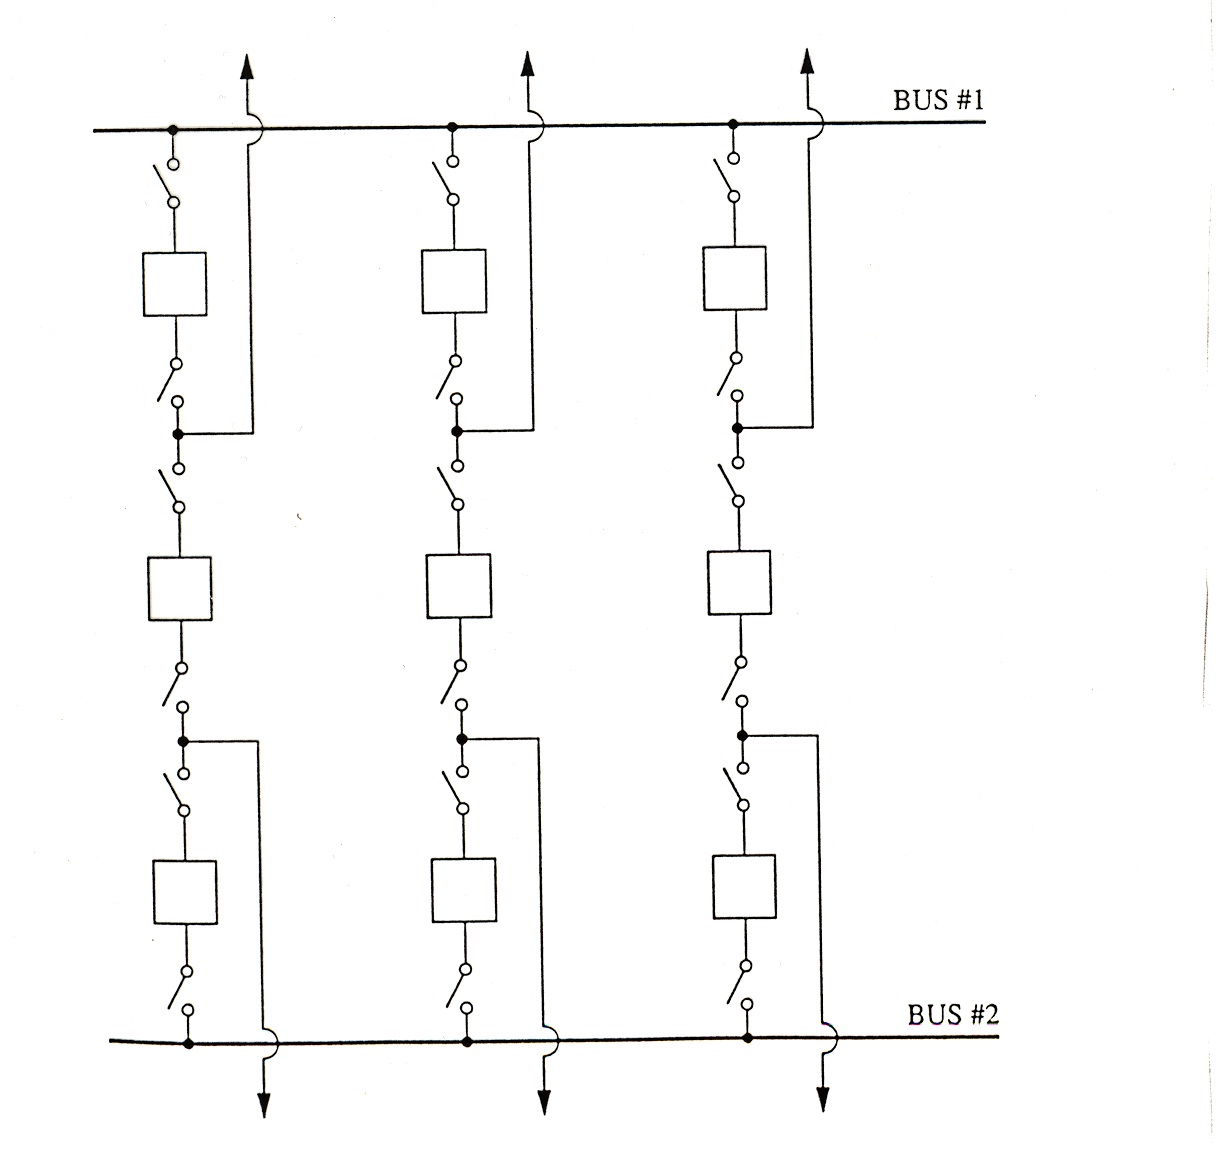 Single Line Diagram Sld